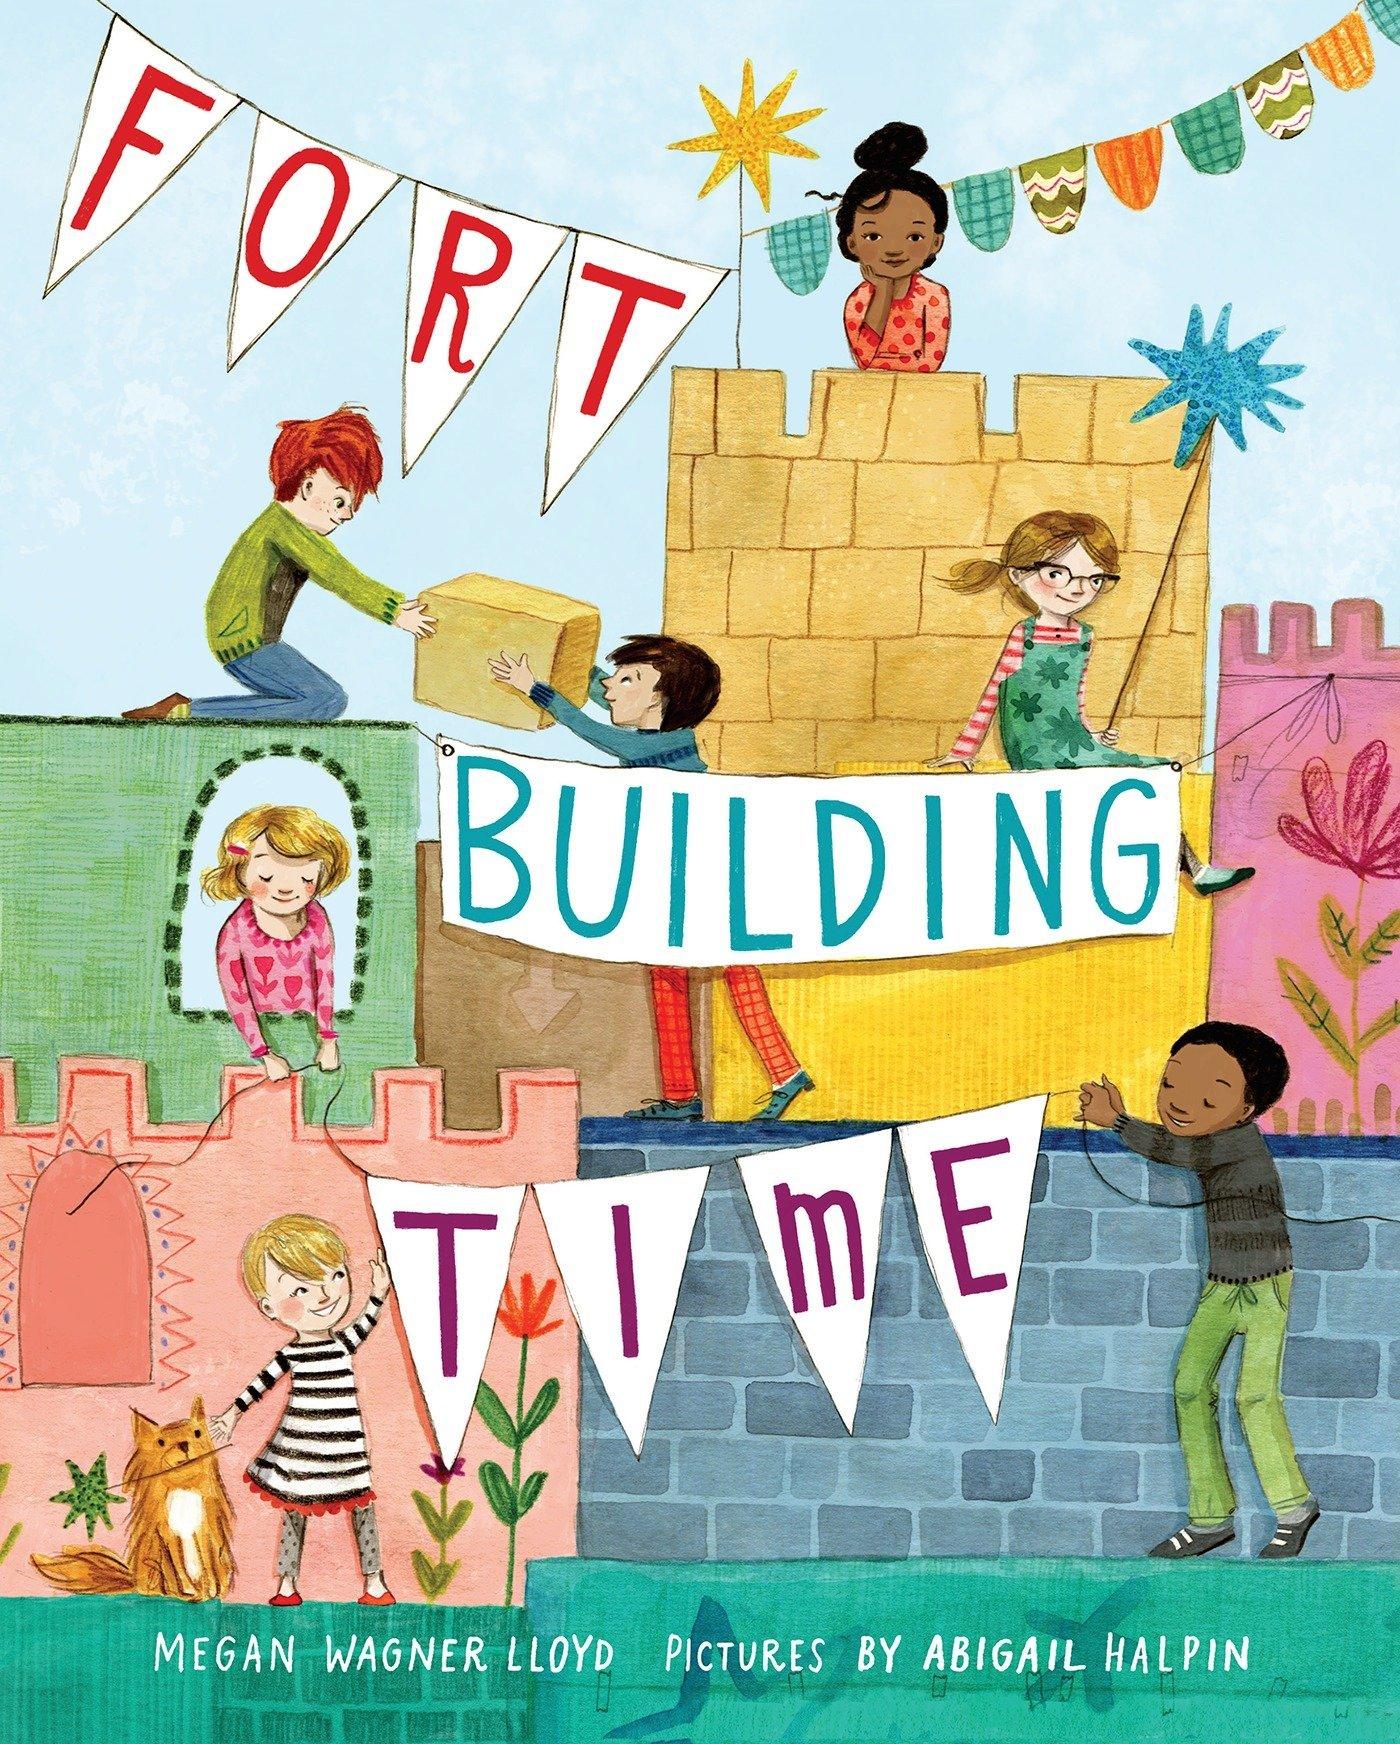 Fort-Building Time ebook